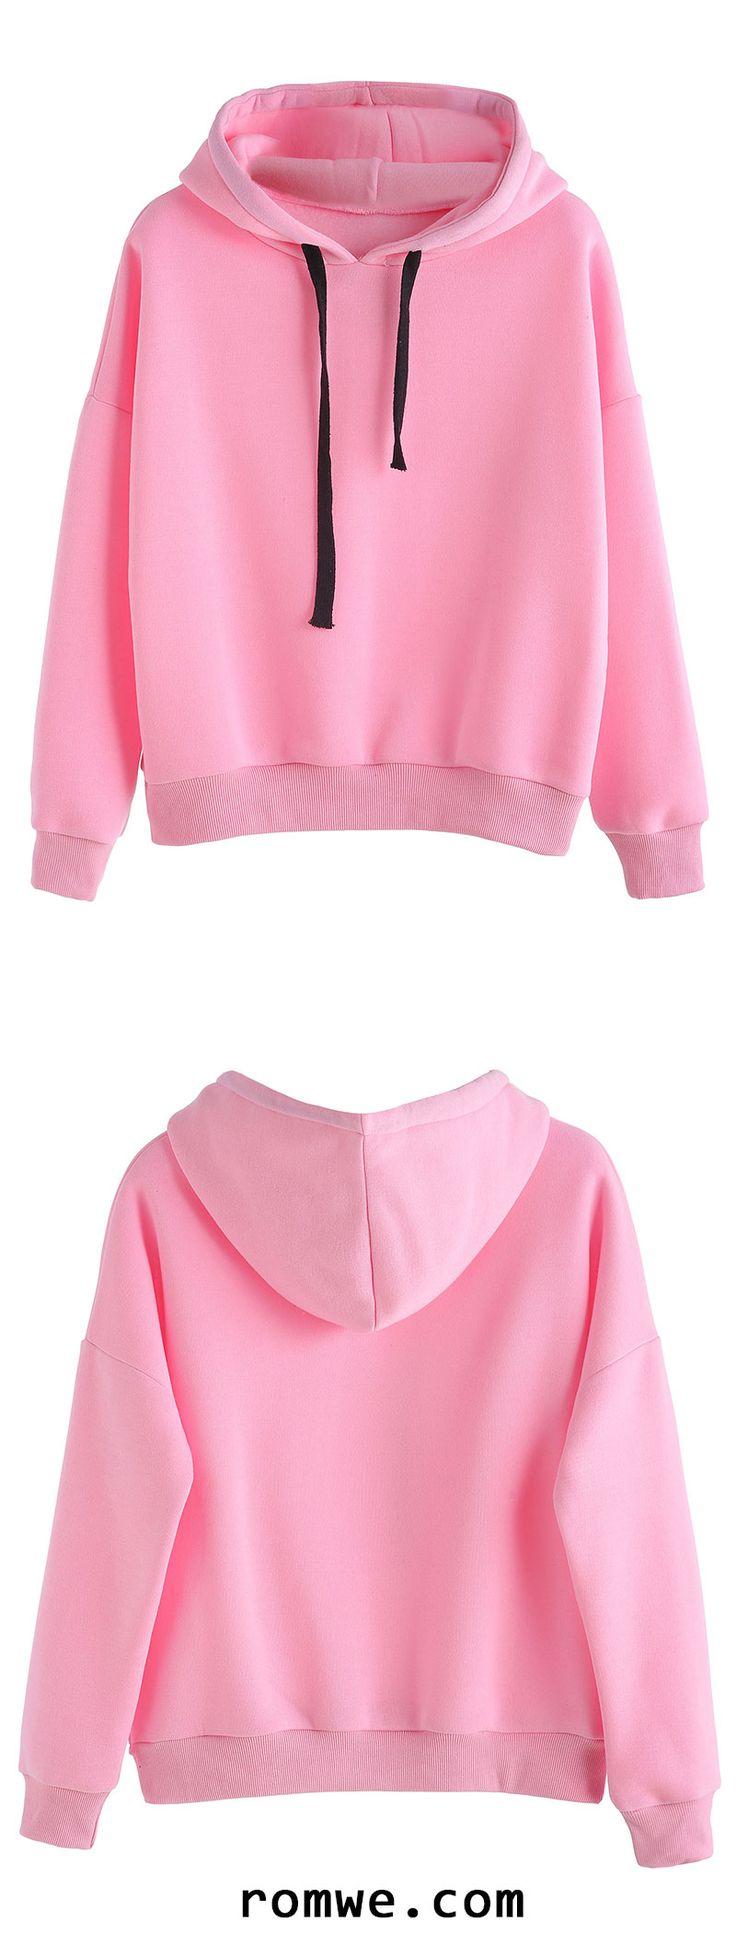 Pink Hooded Sweatshirt With Drawstring In Black